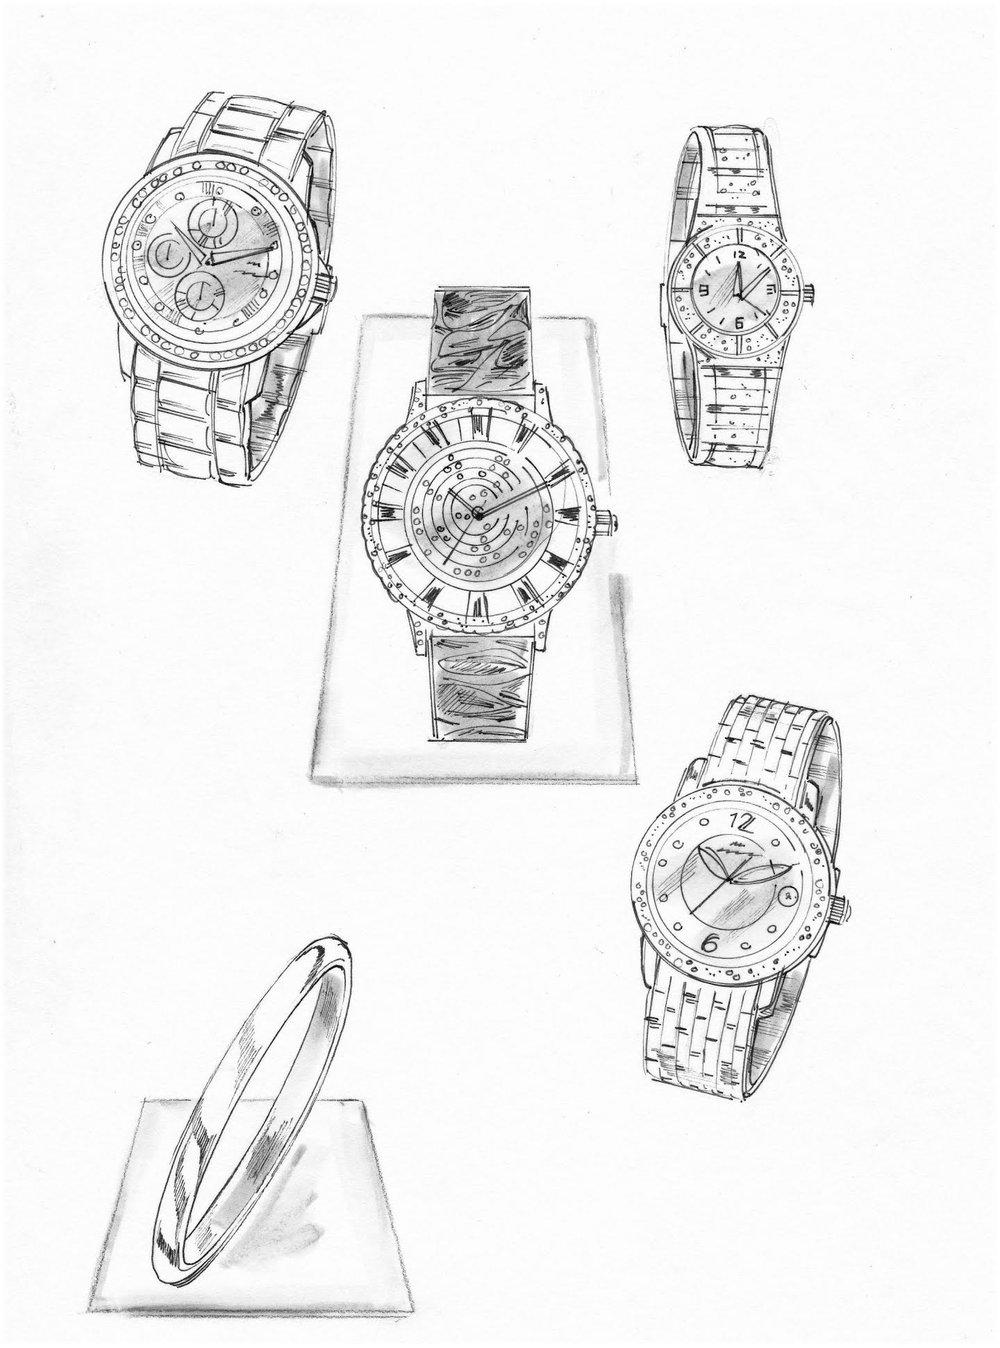 graphic watches3.jpg